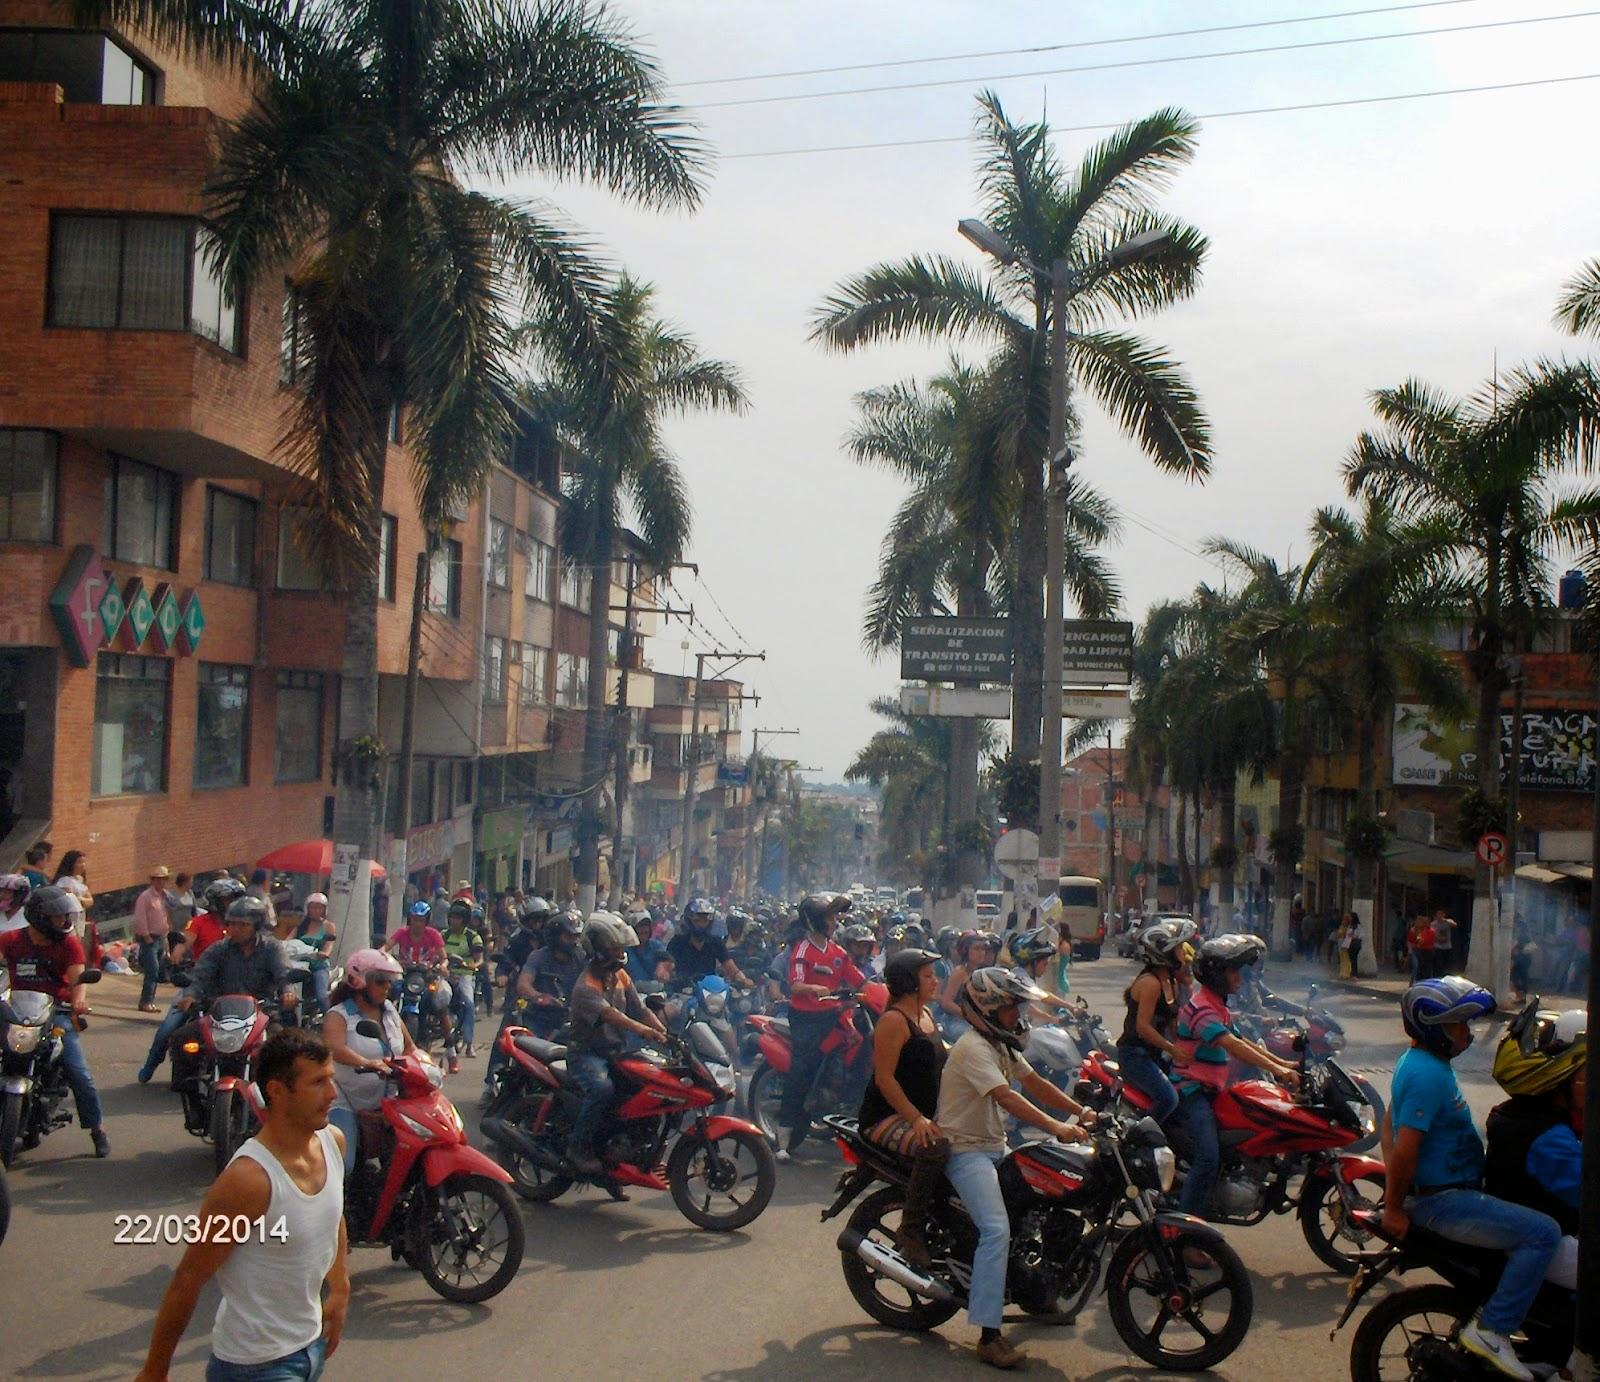 http://fusagasugaprensametronet.blogspot.com/2014/03/motociclistas-se-movilizaron-contra-el.html